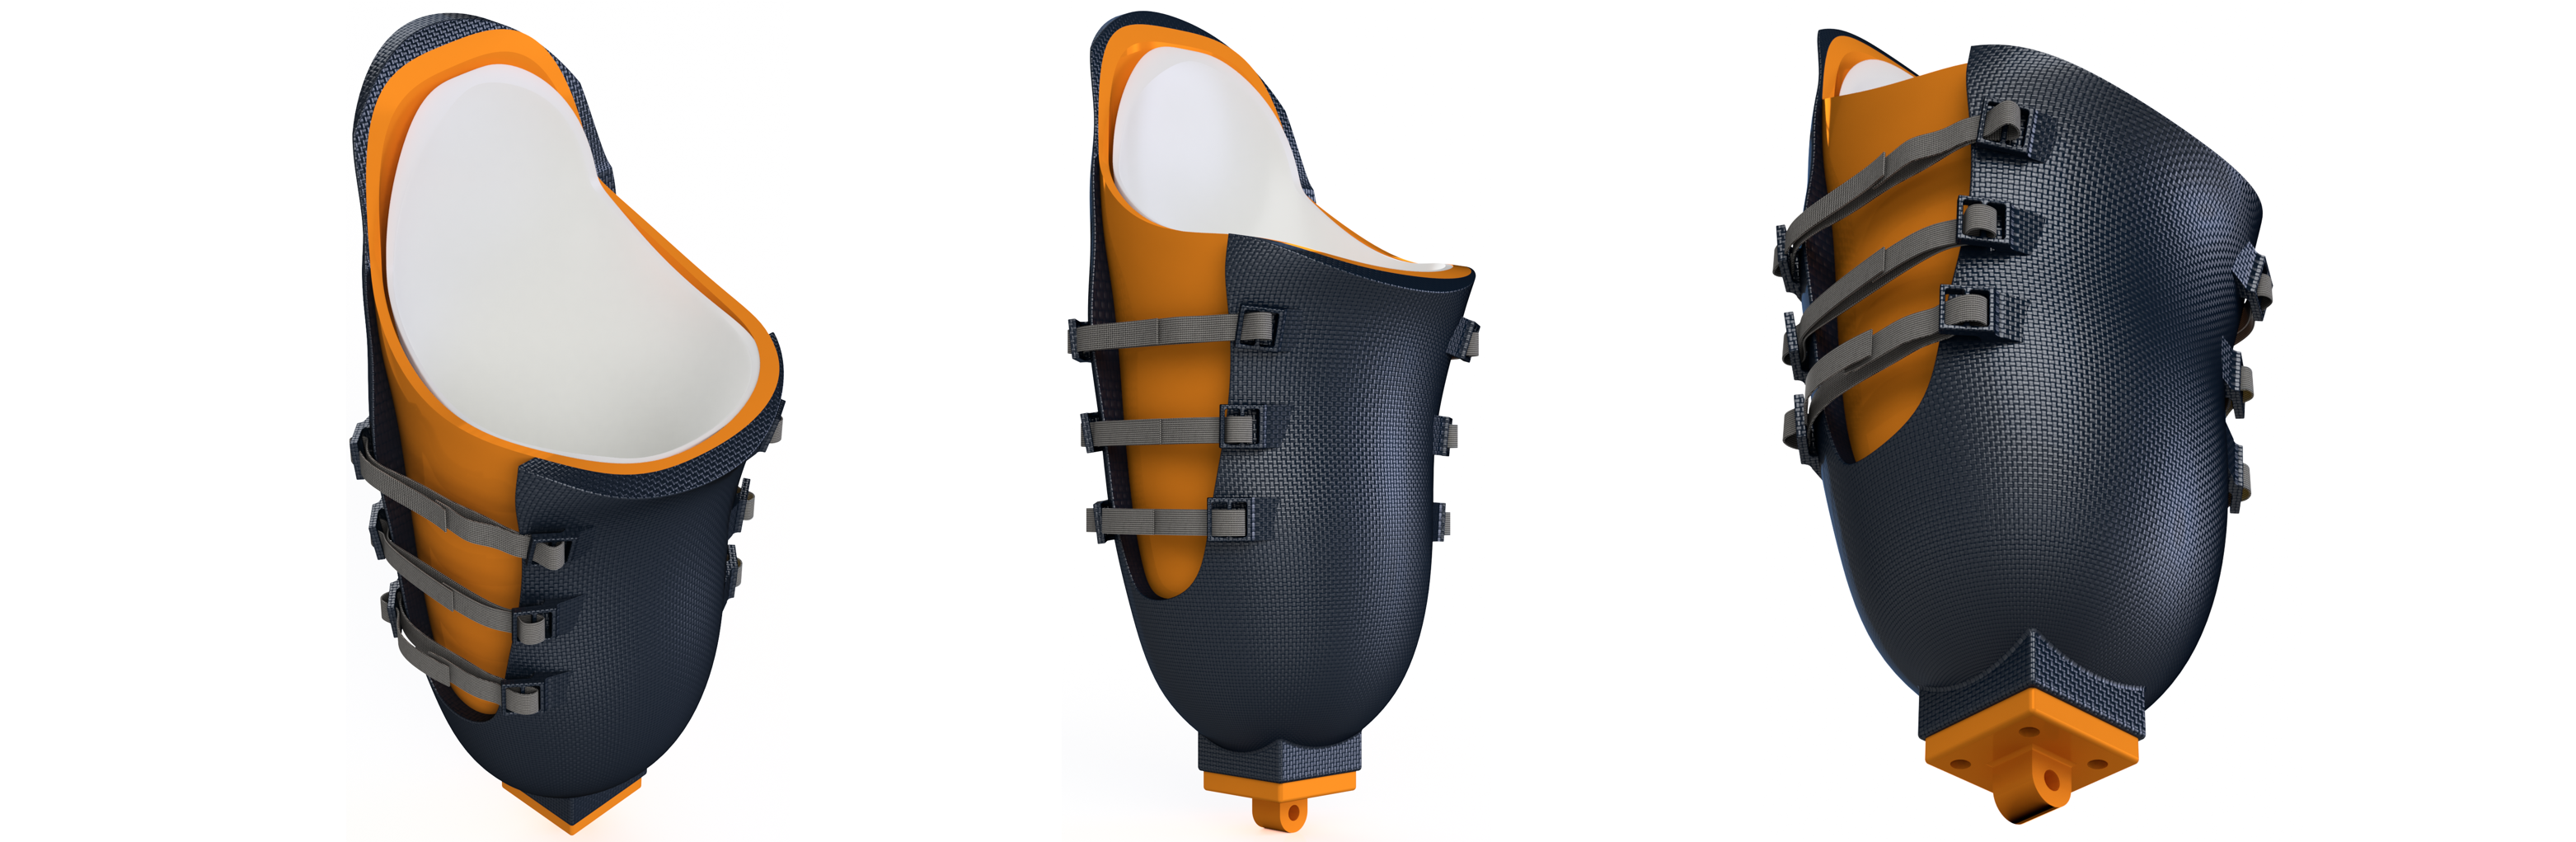 Product Design Prosthetic Design